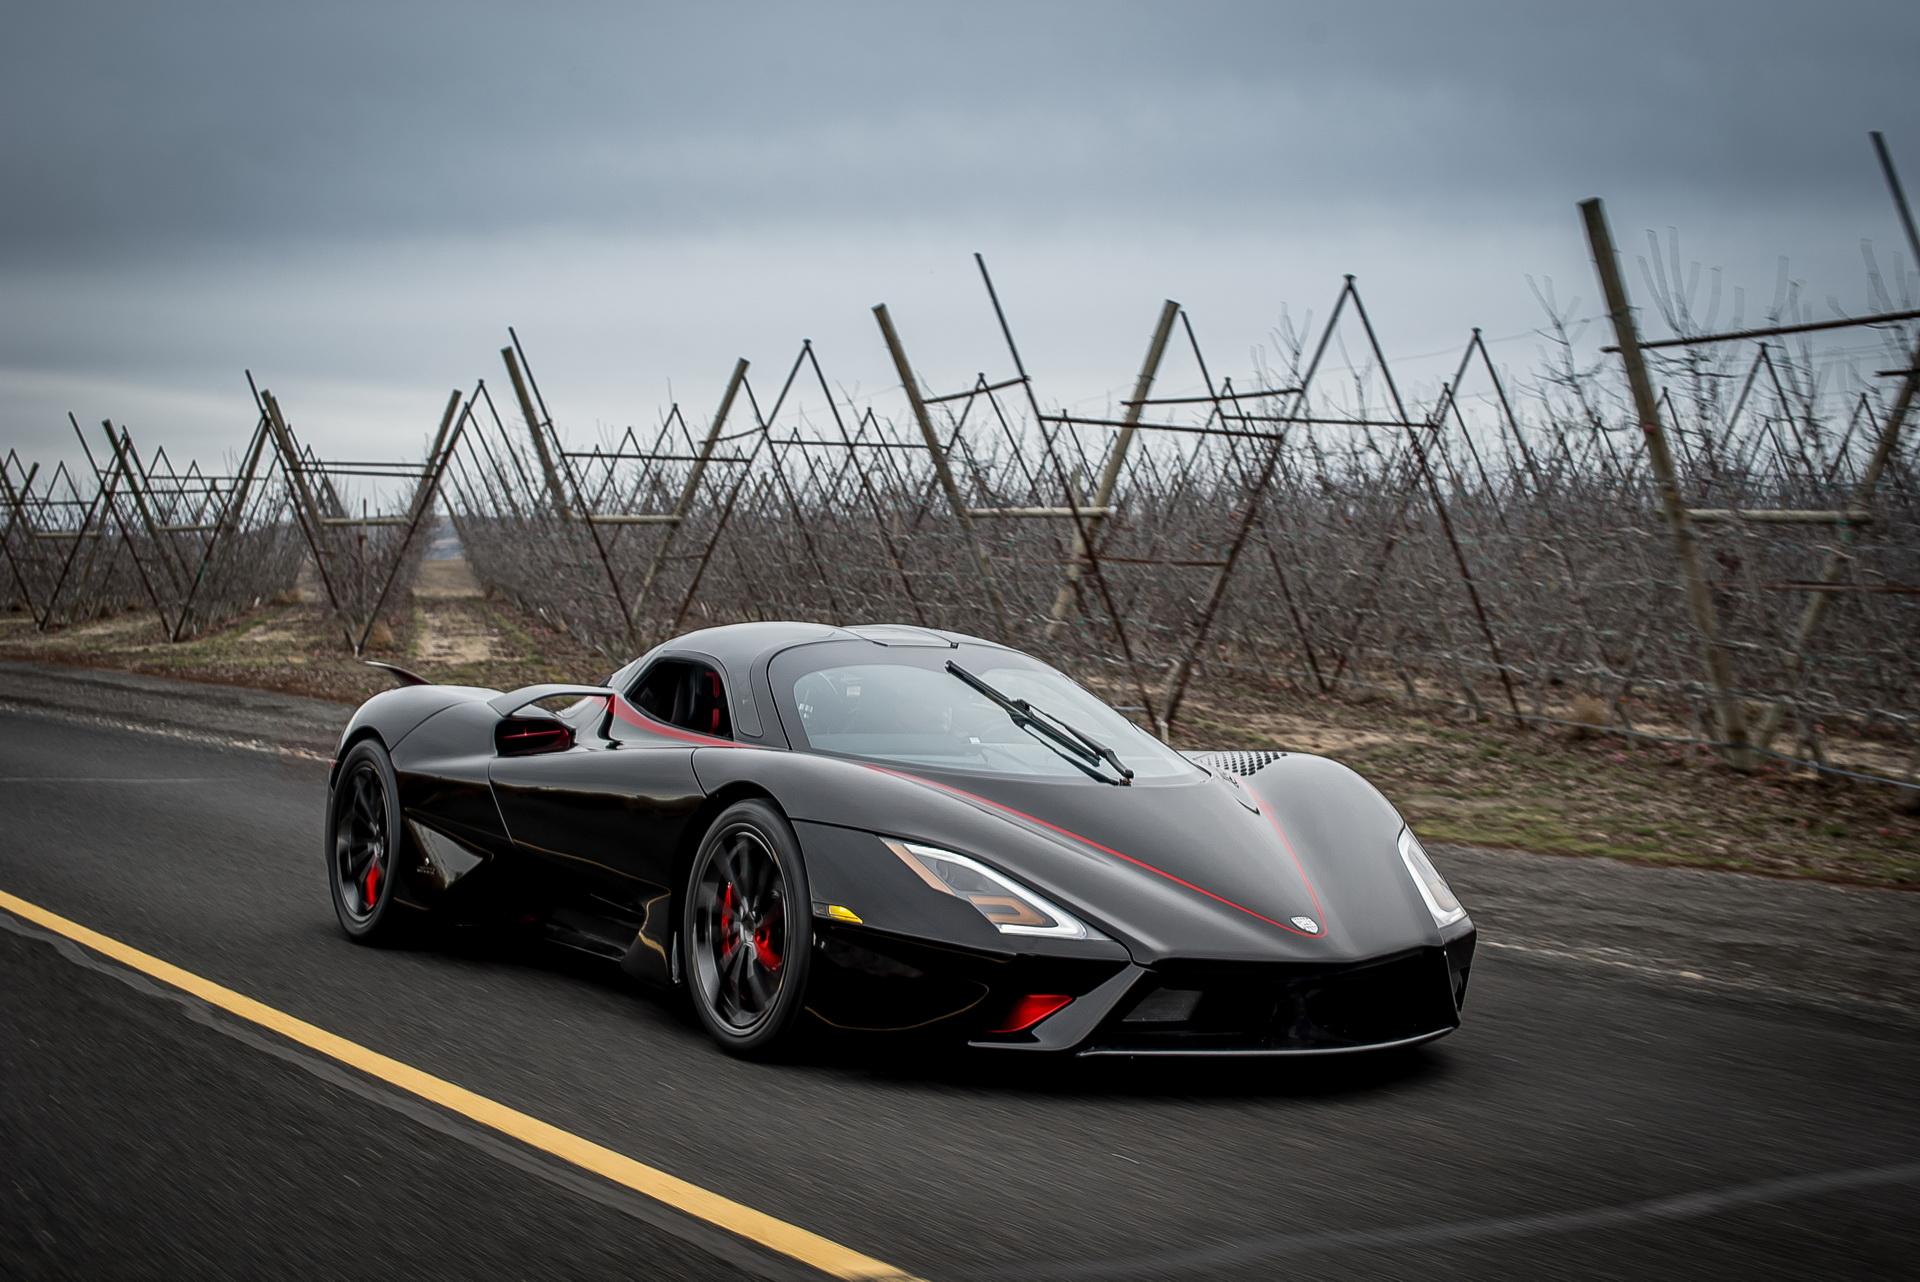 SSC تواتارا تصبح أسرع سيارة في العالم بتحقيق سرعة 532.7 كلم/س – فيديو